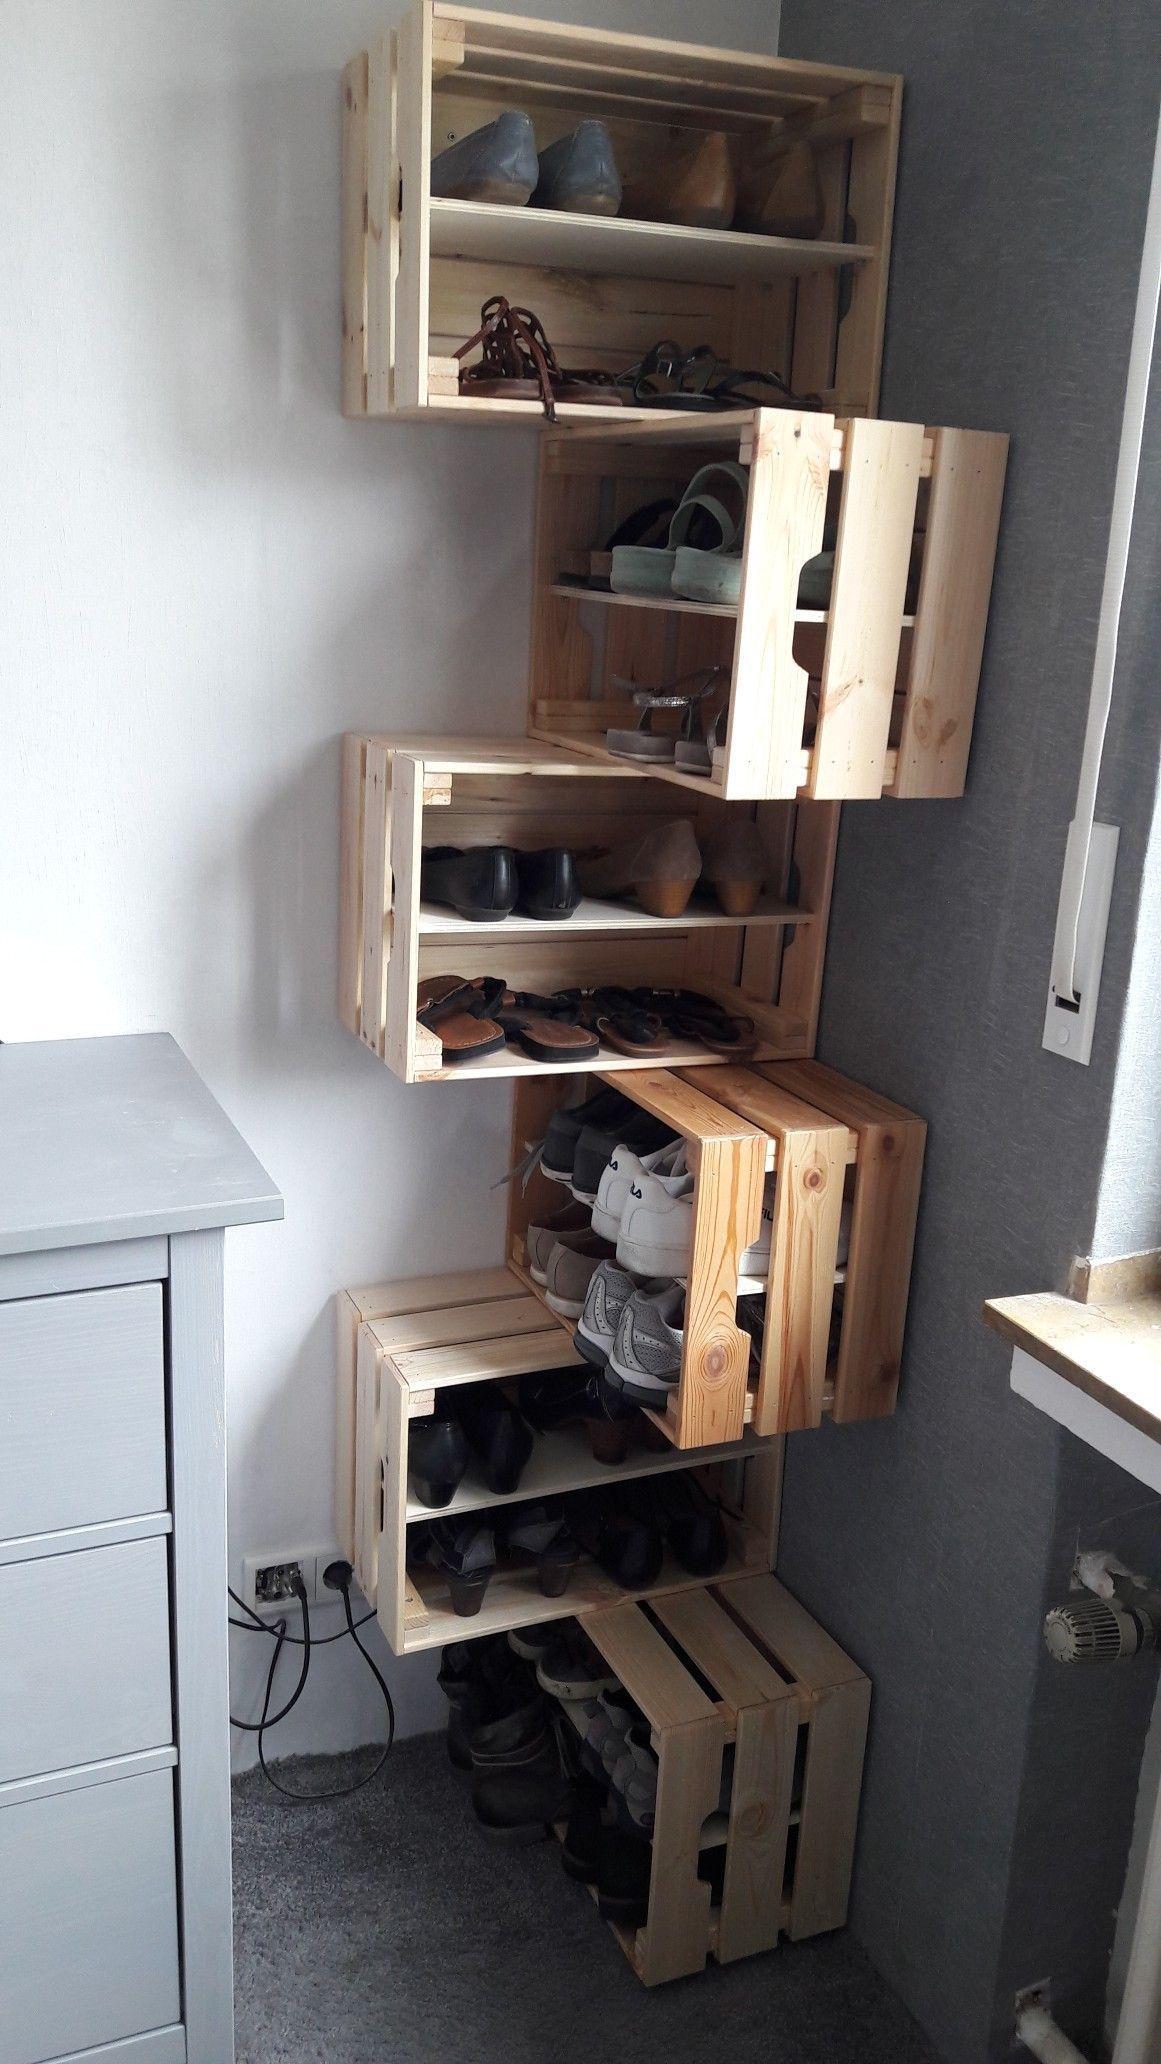 DIY Schuhregal aus Kisten über Eck – dishthin.teachinformation.com – Blog